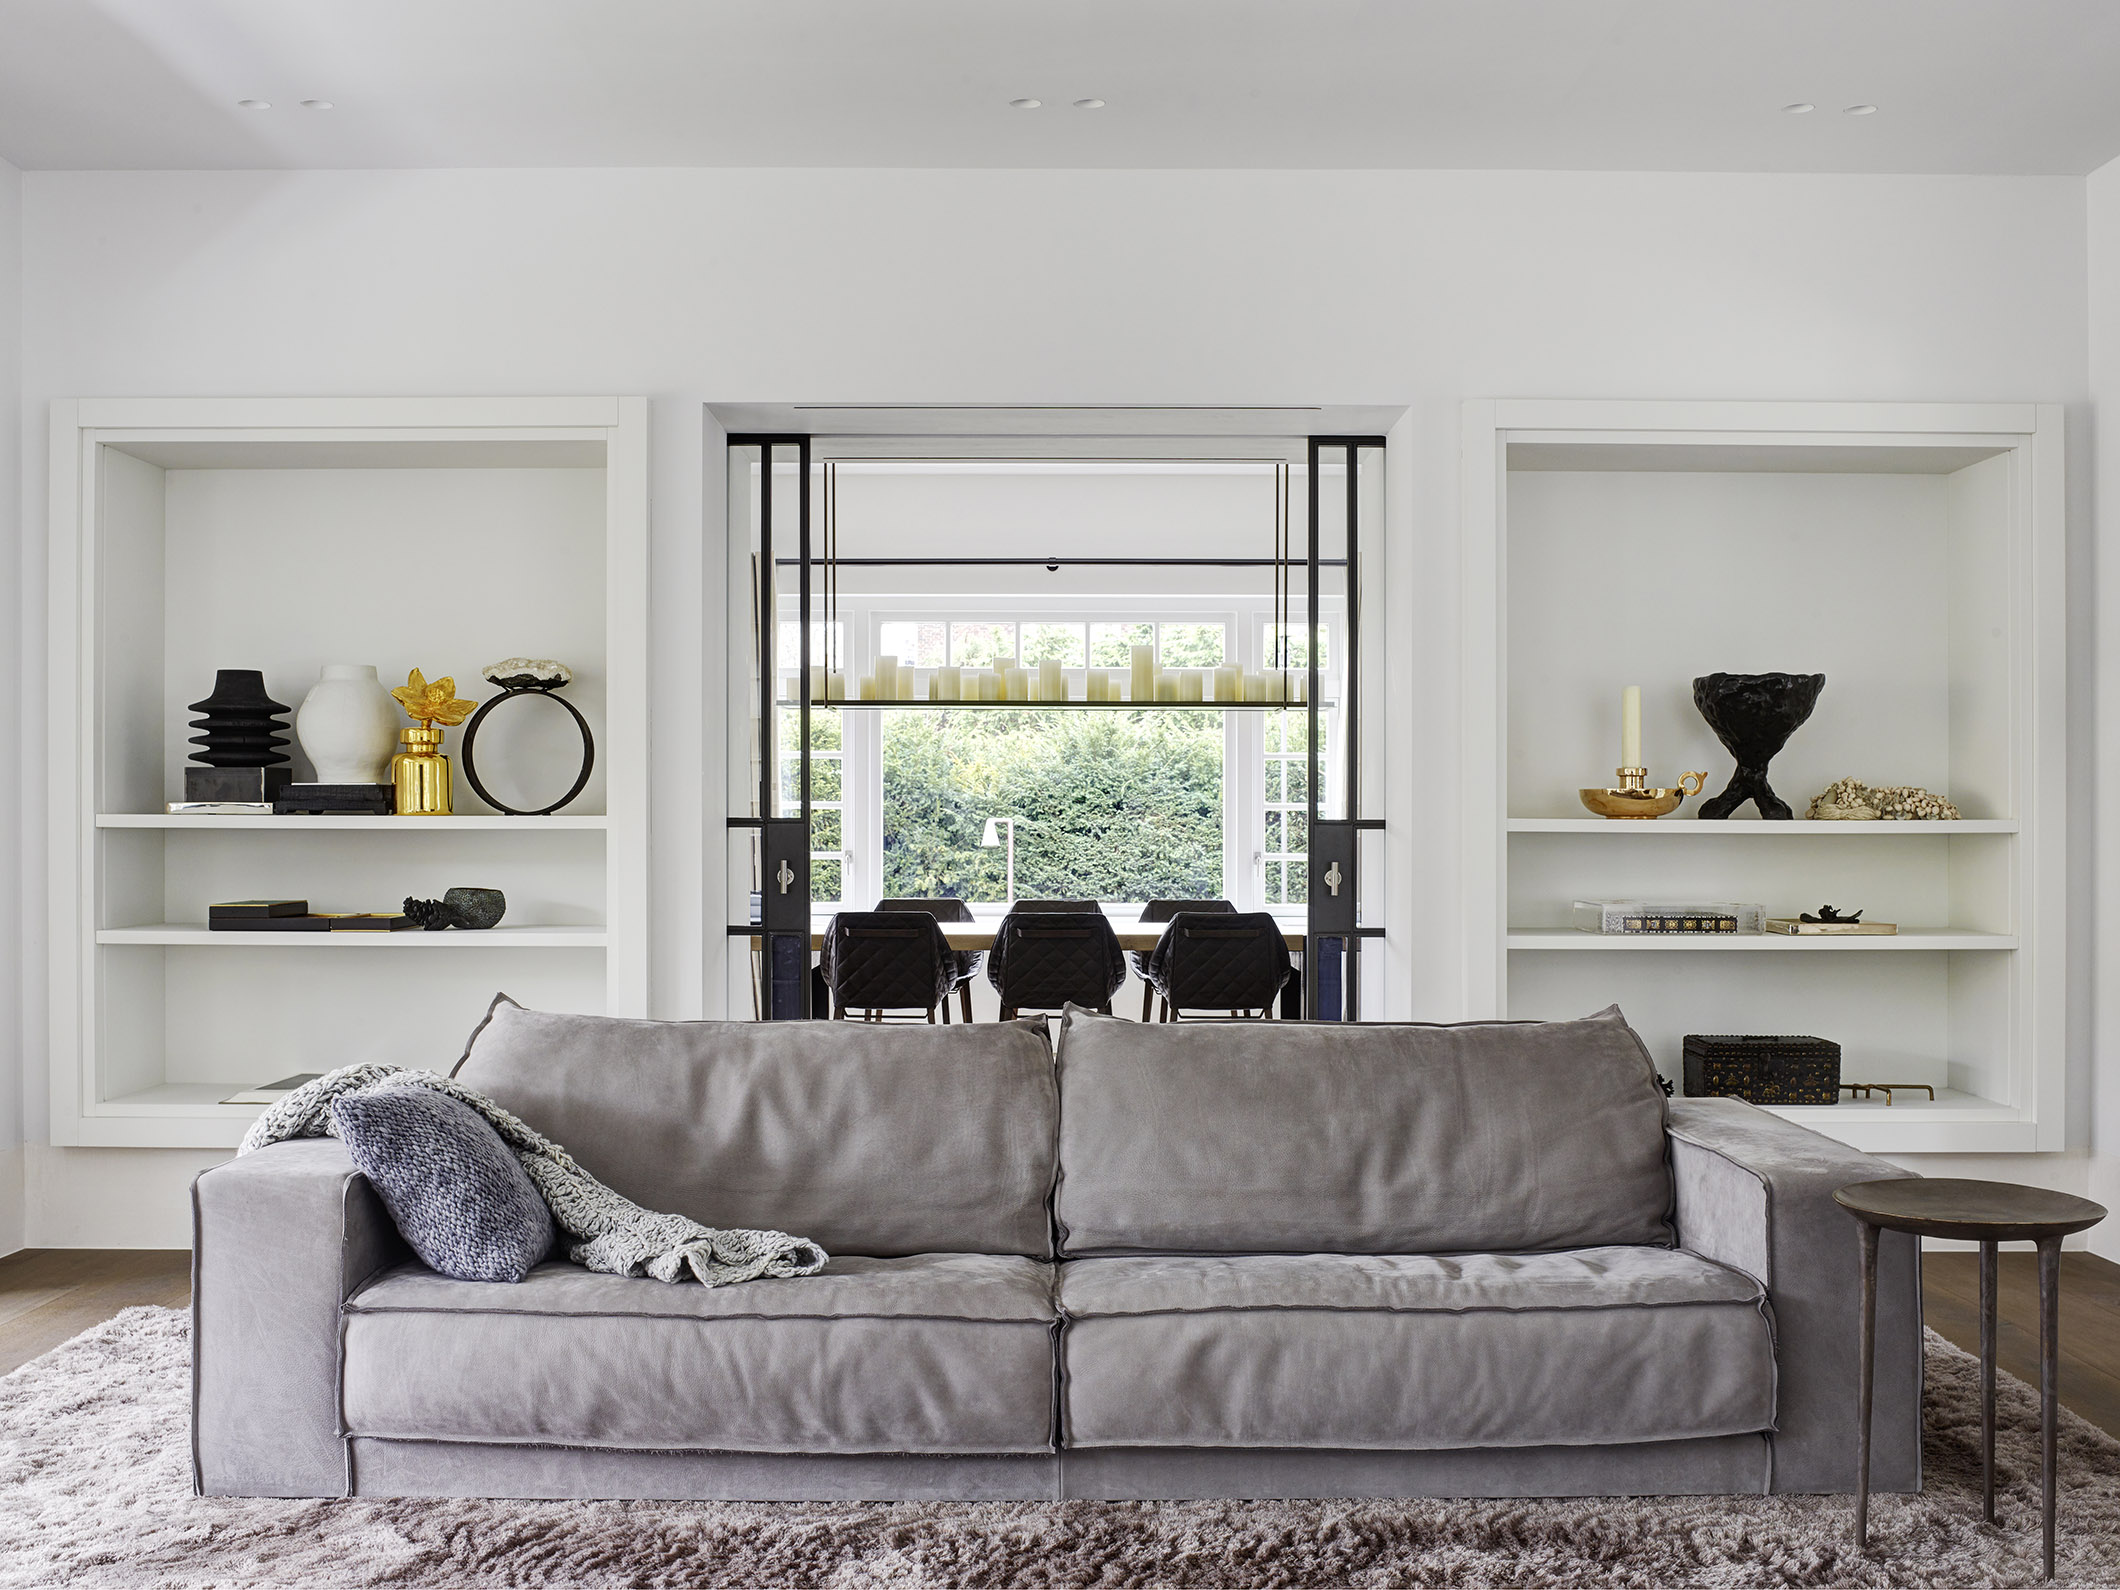 Urban Residence Amsterdam with KEKKE dining chair